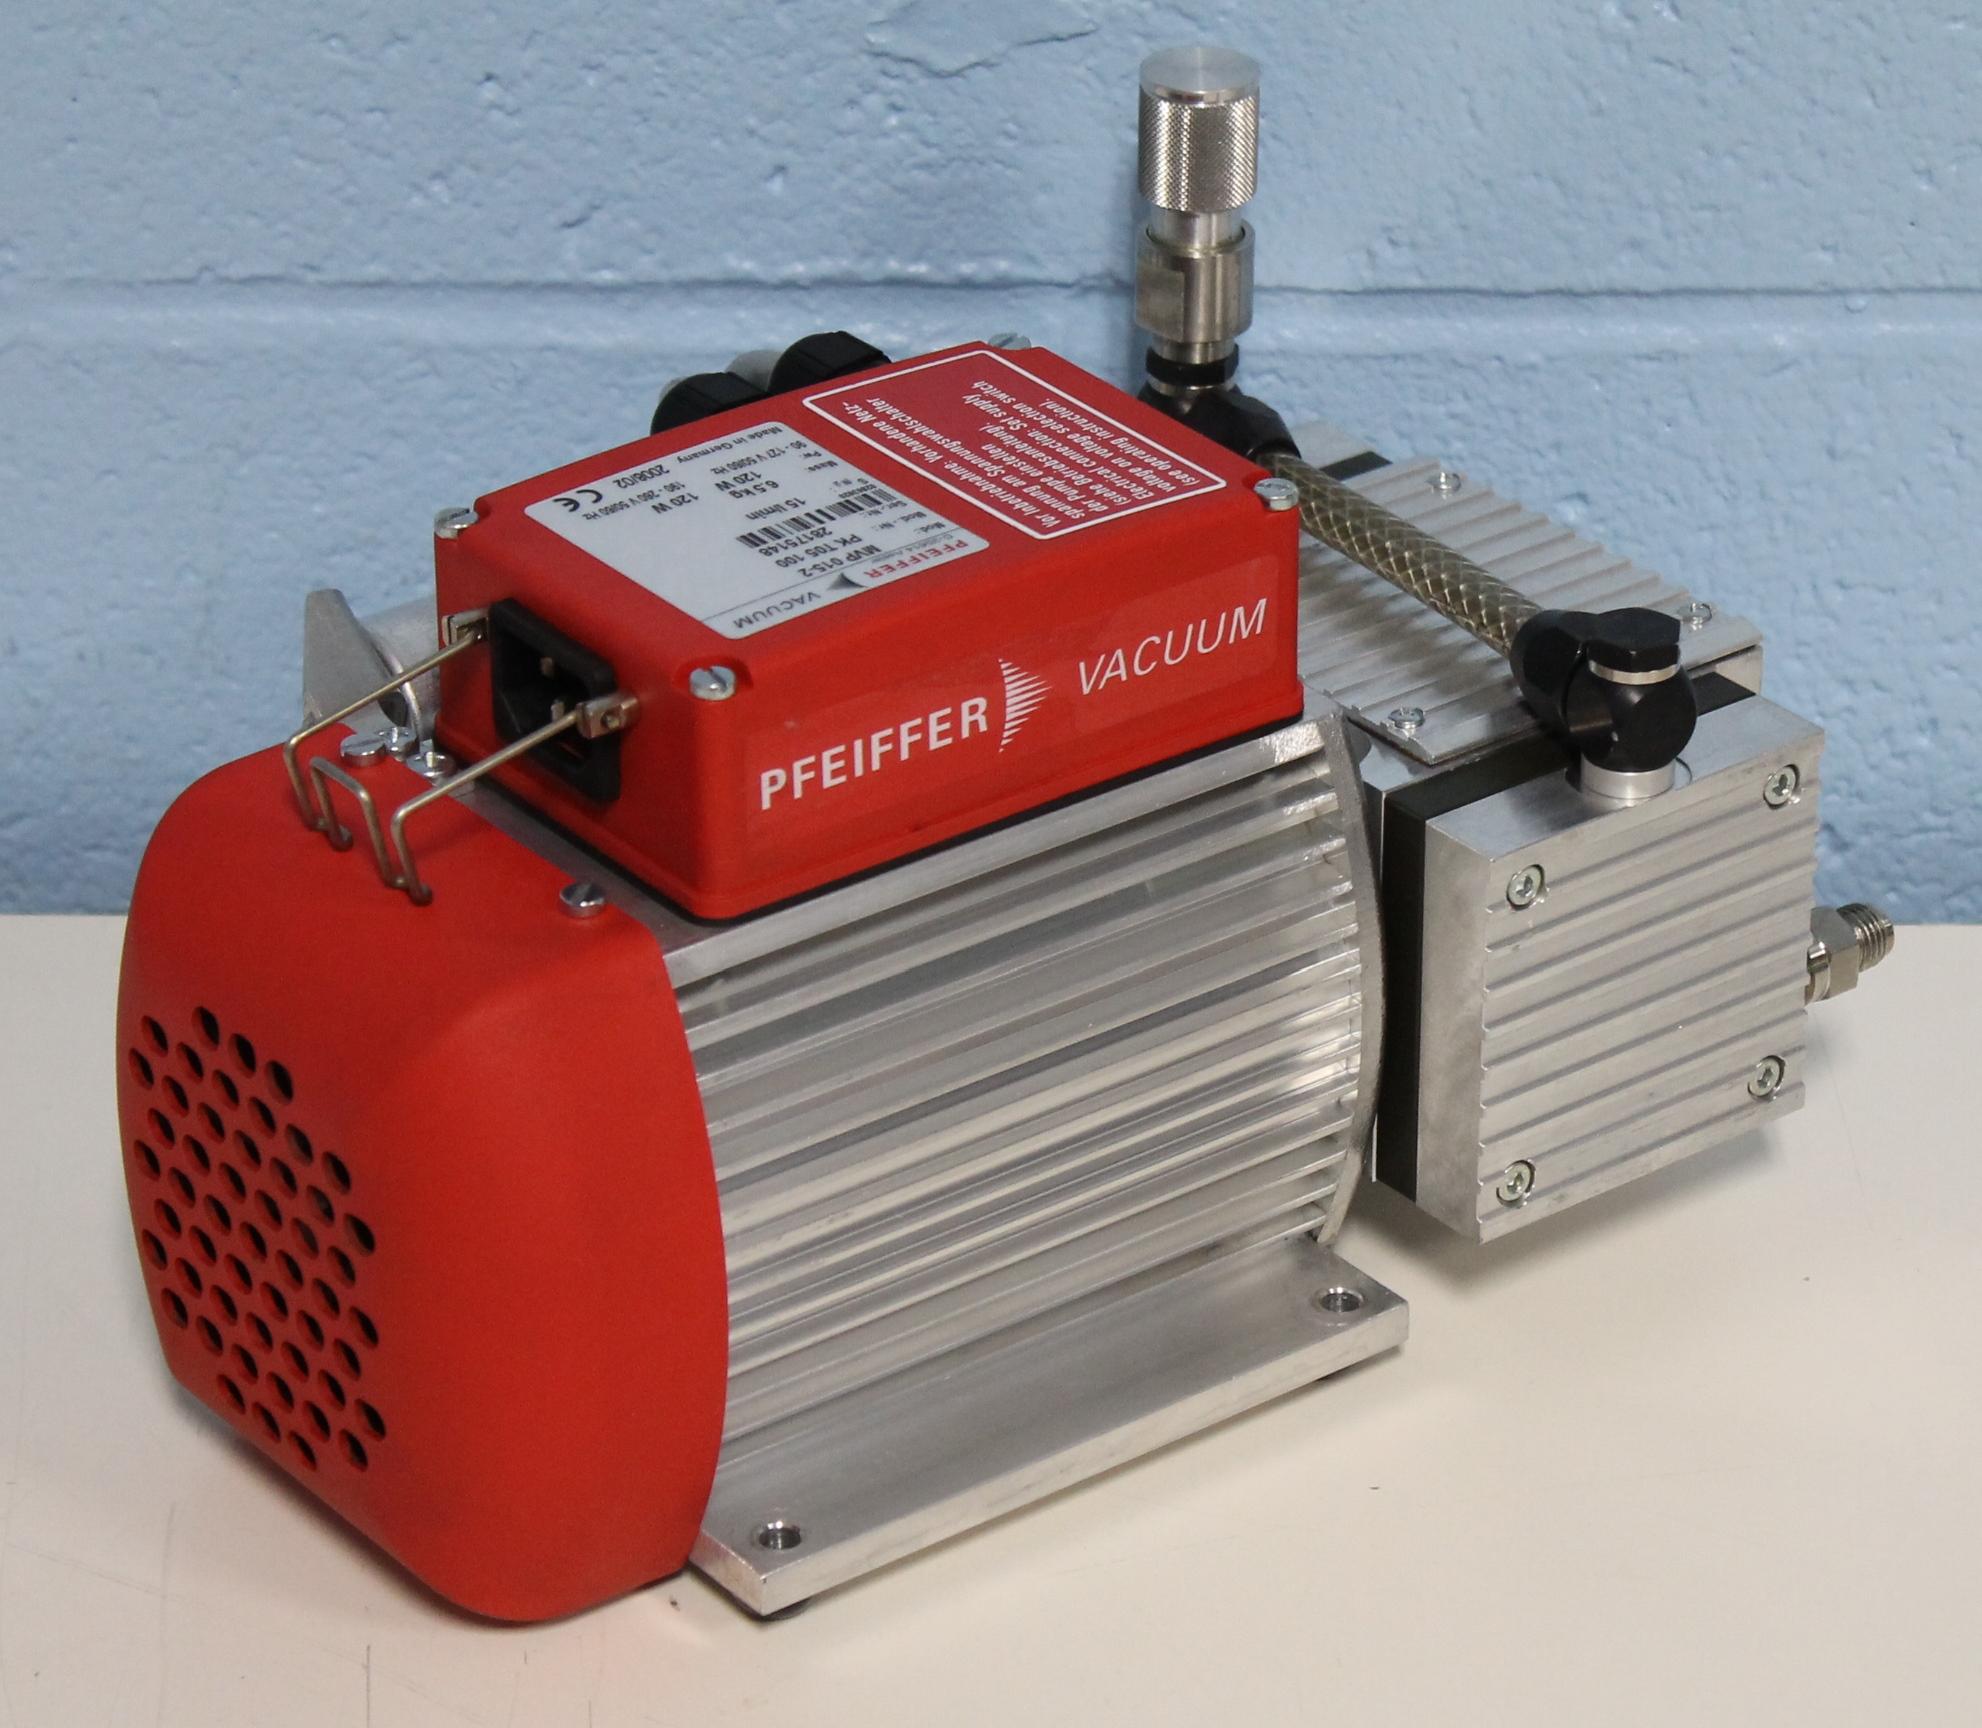 Refurbished Pfeiffer Vacuum Mvp 015 2 Diaphragm Vacuum Pump